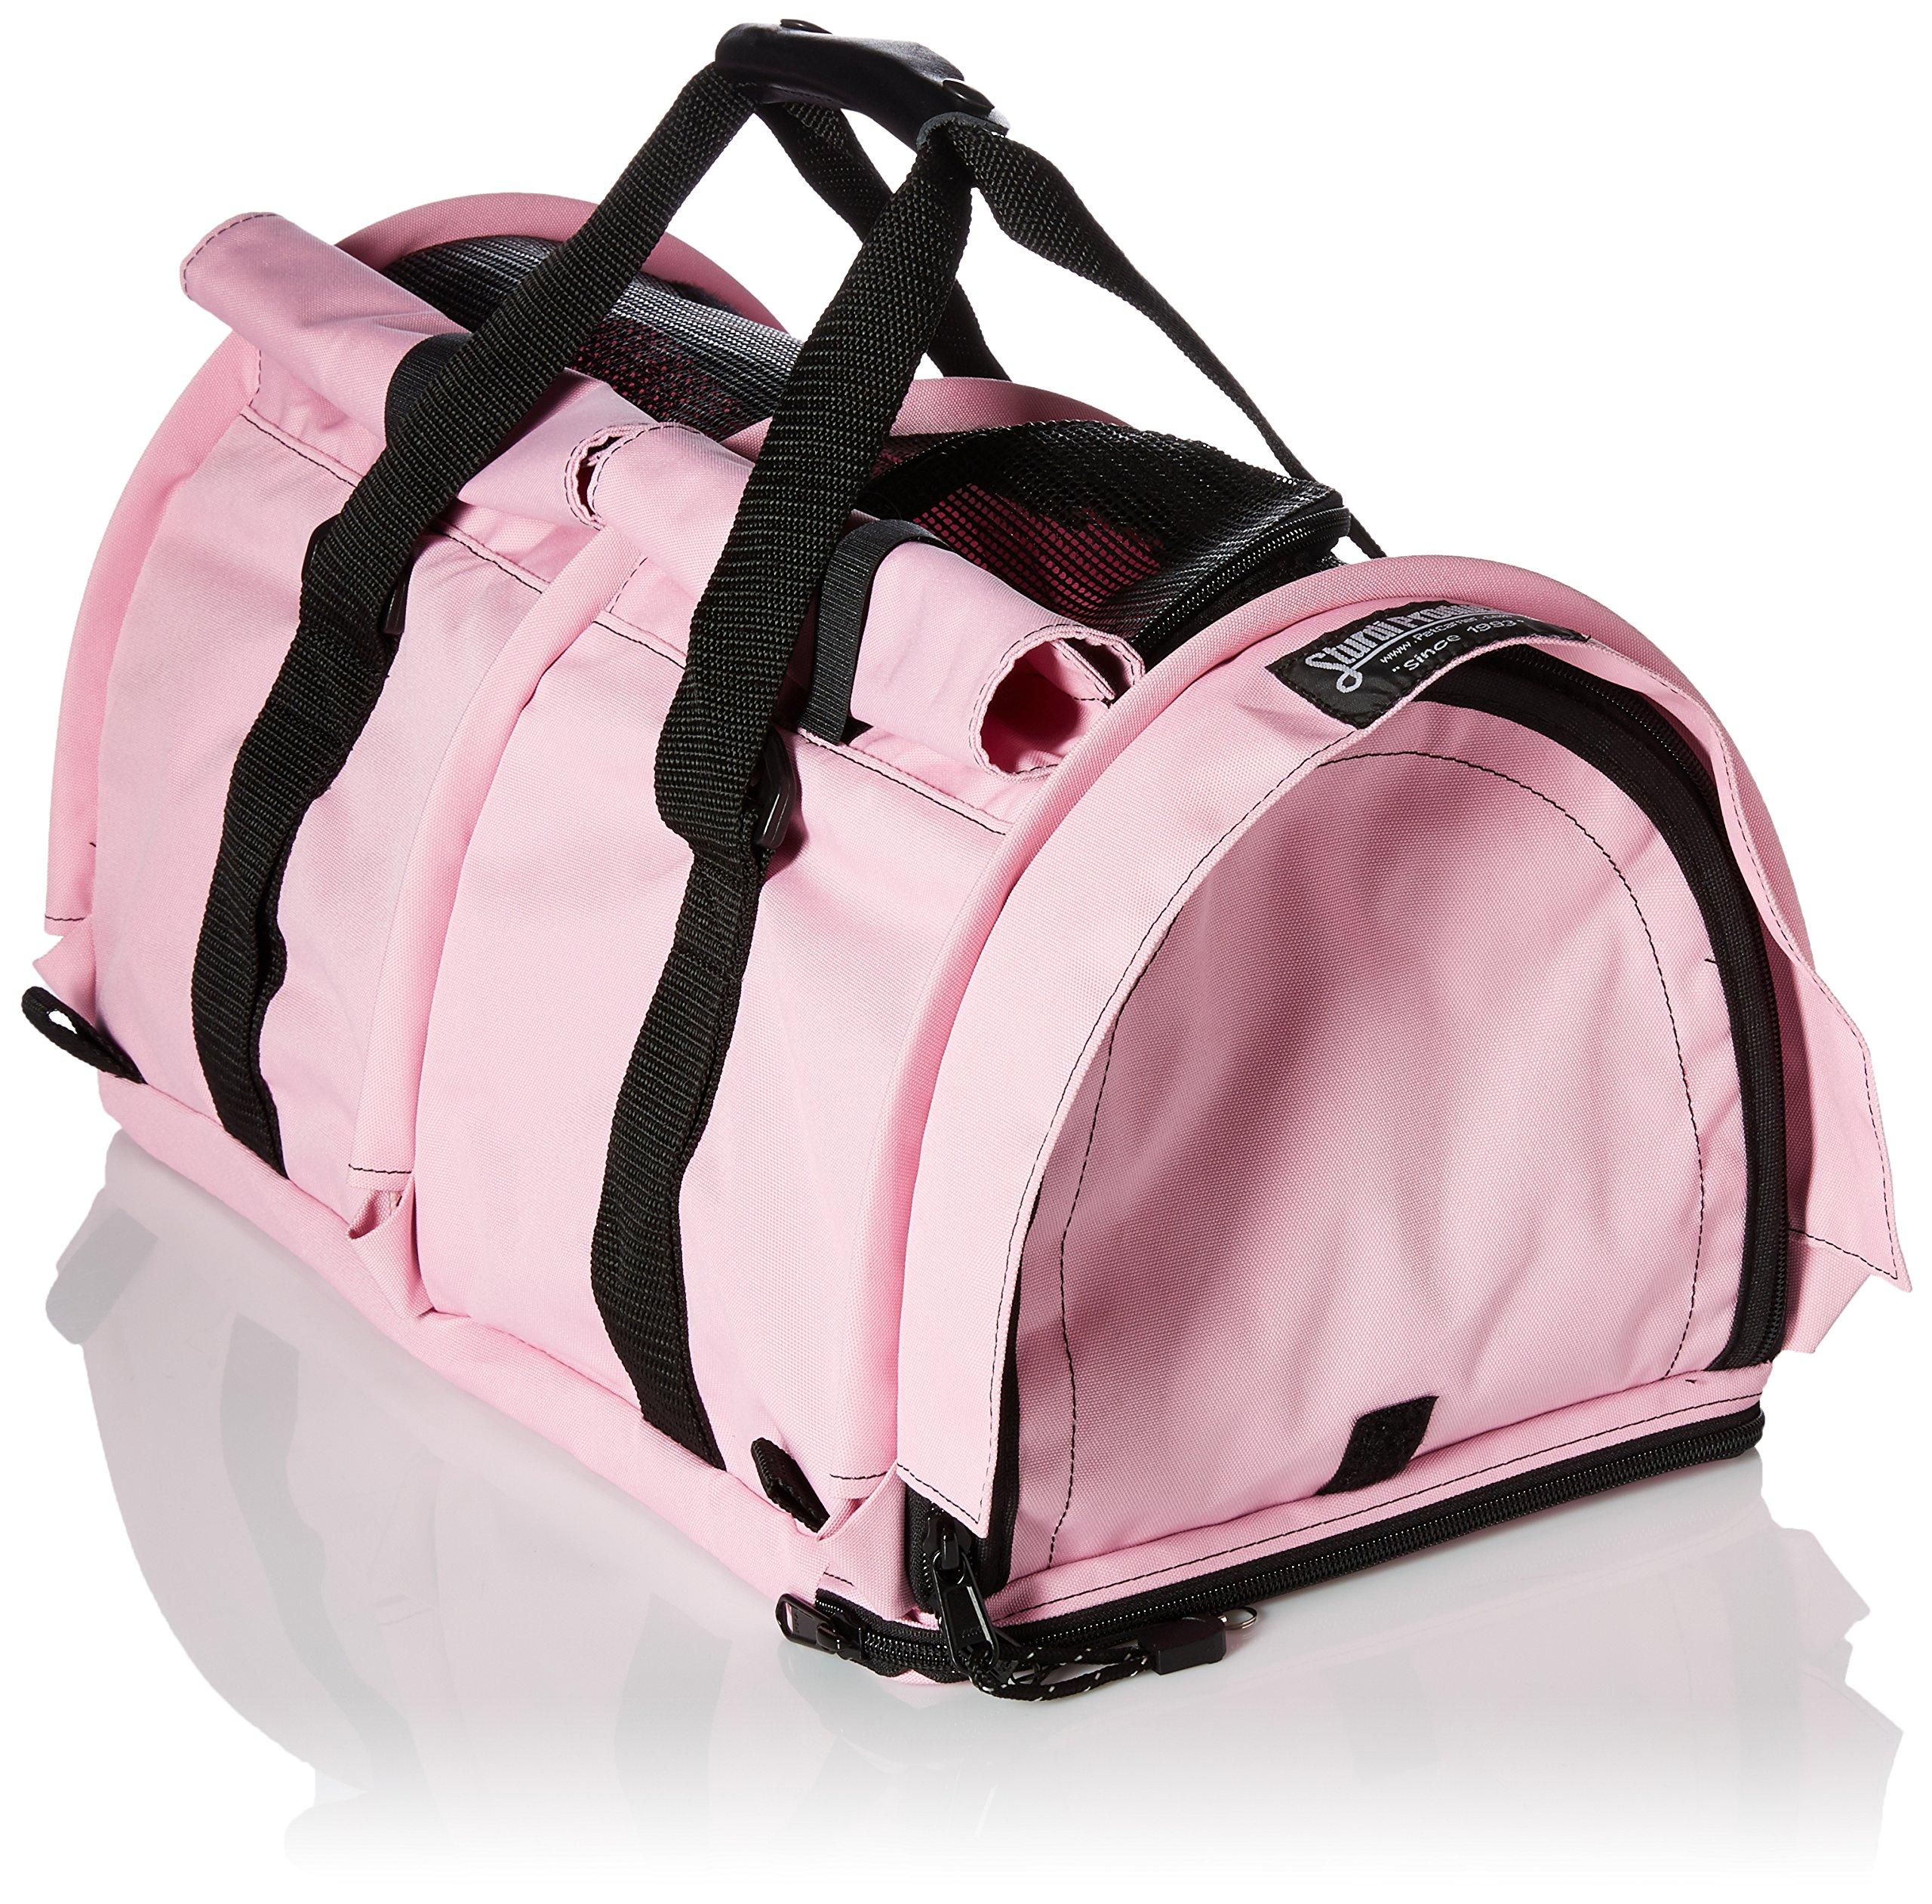 Sturdi Products SturdiBag Pet Carrier, Small, Soft Pink